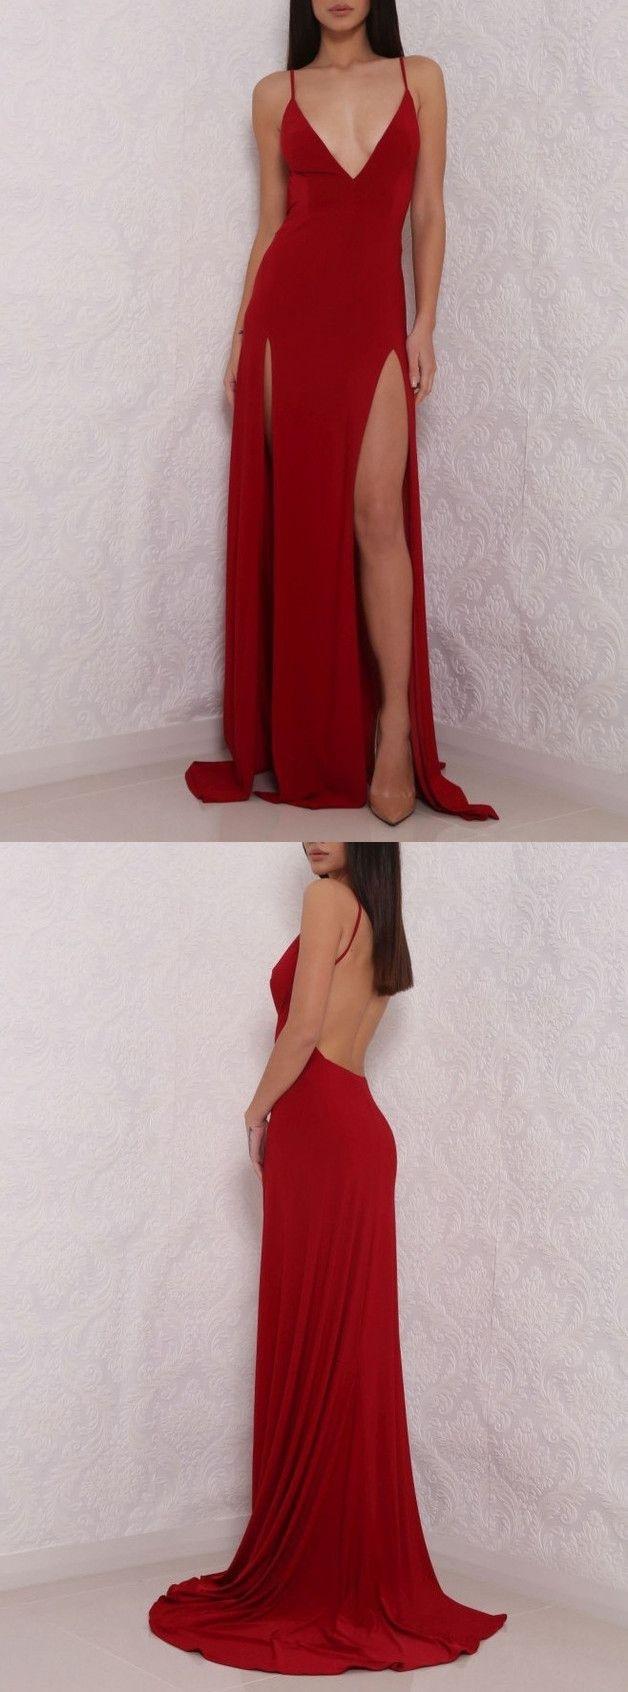 Designer Fantastisch Abiballkleider Lang Rot Vertrieb20 Leicht Abiballkleider Lang Rot für 2019